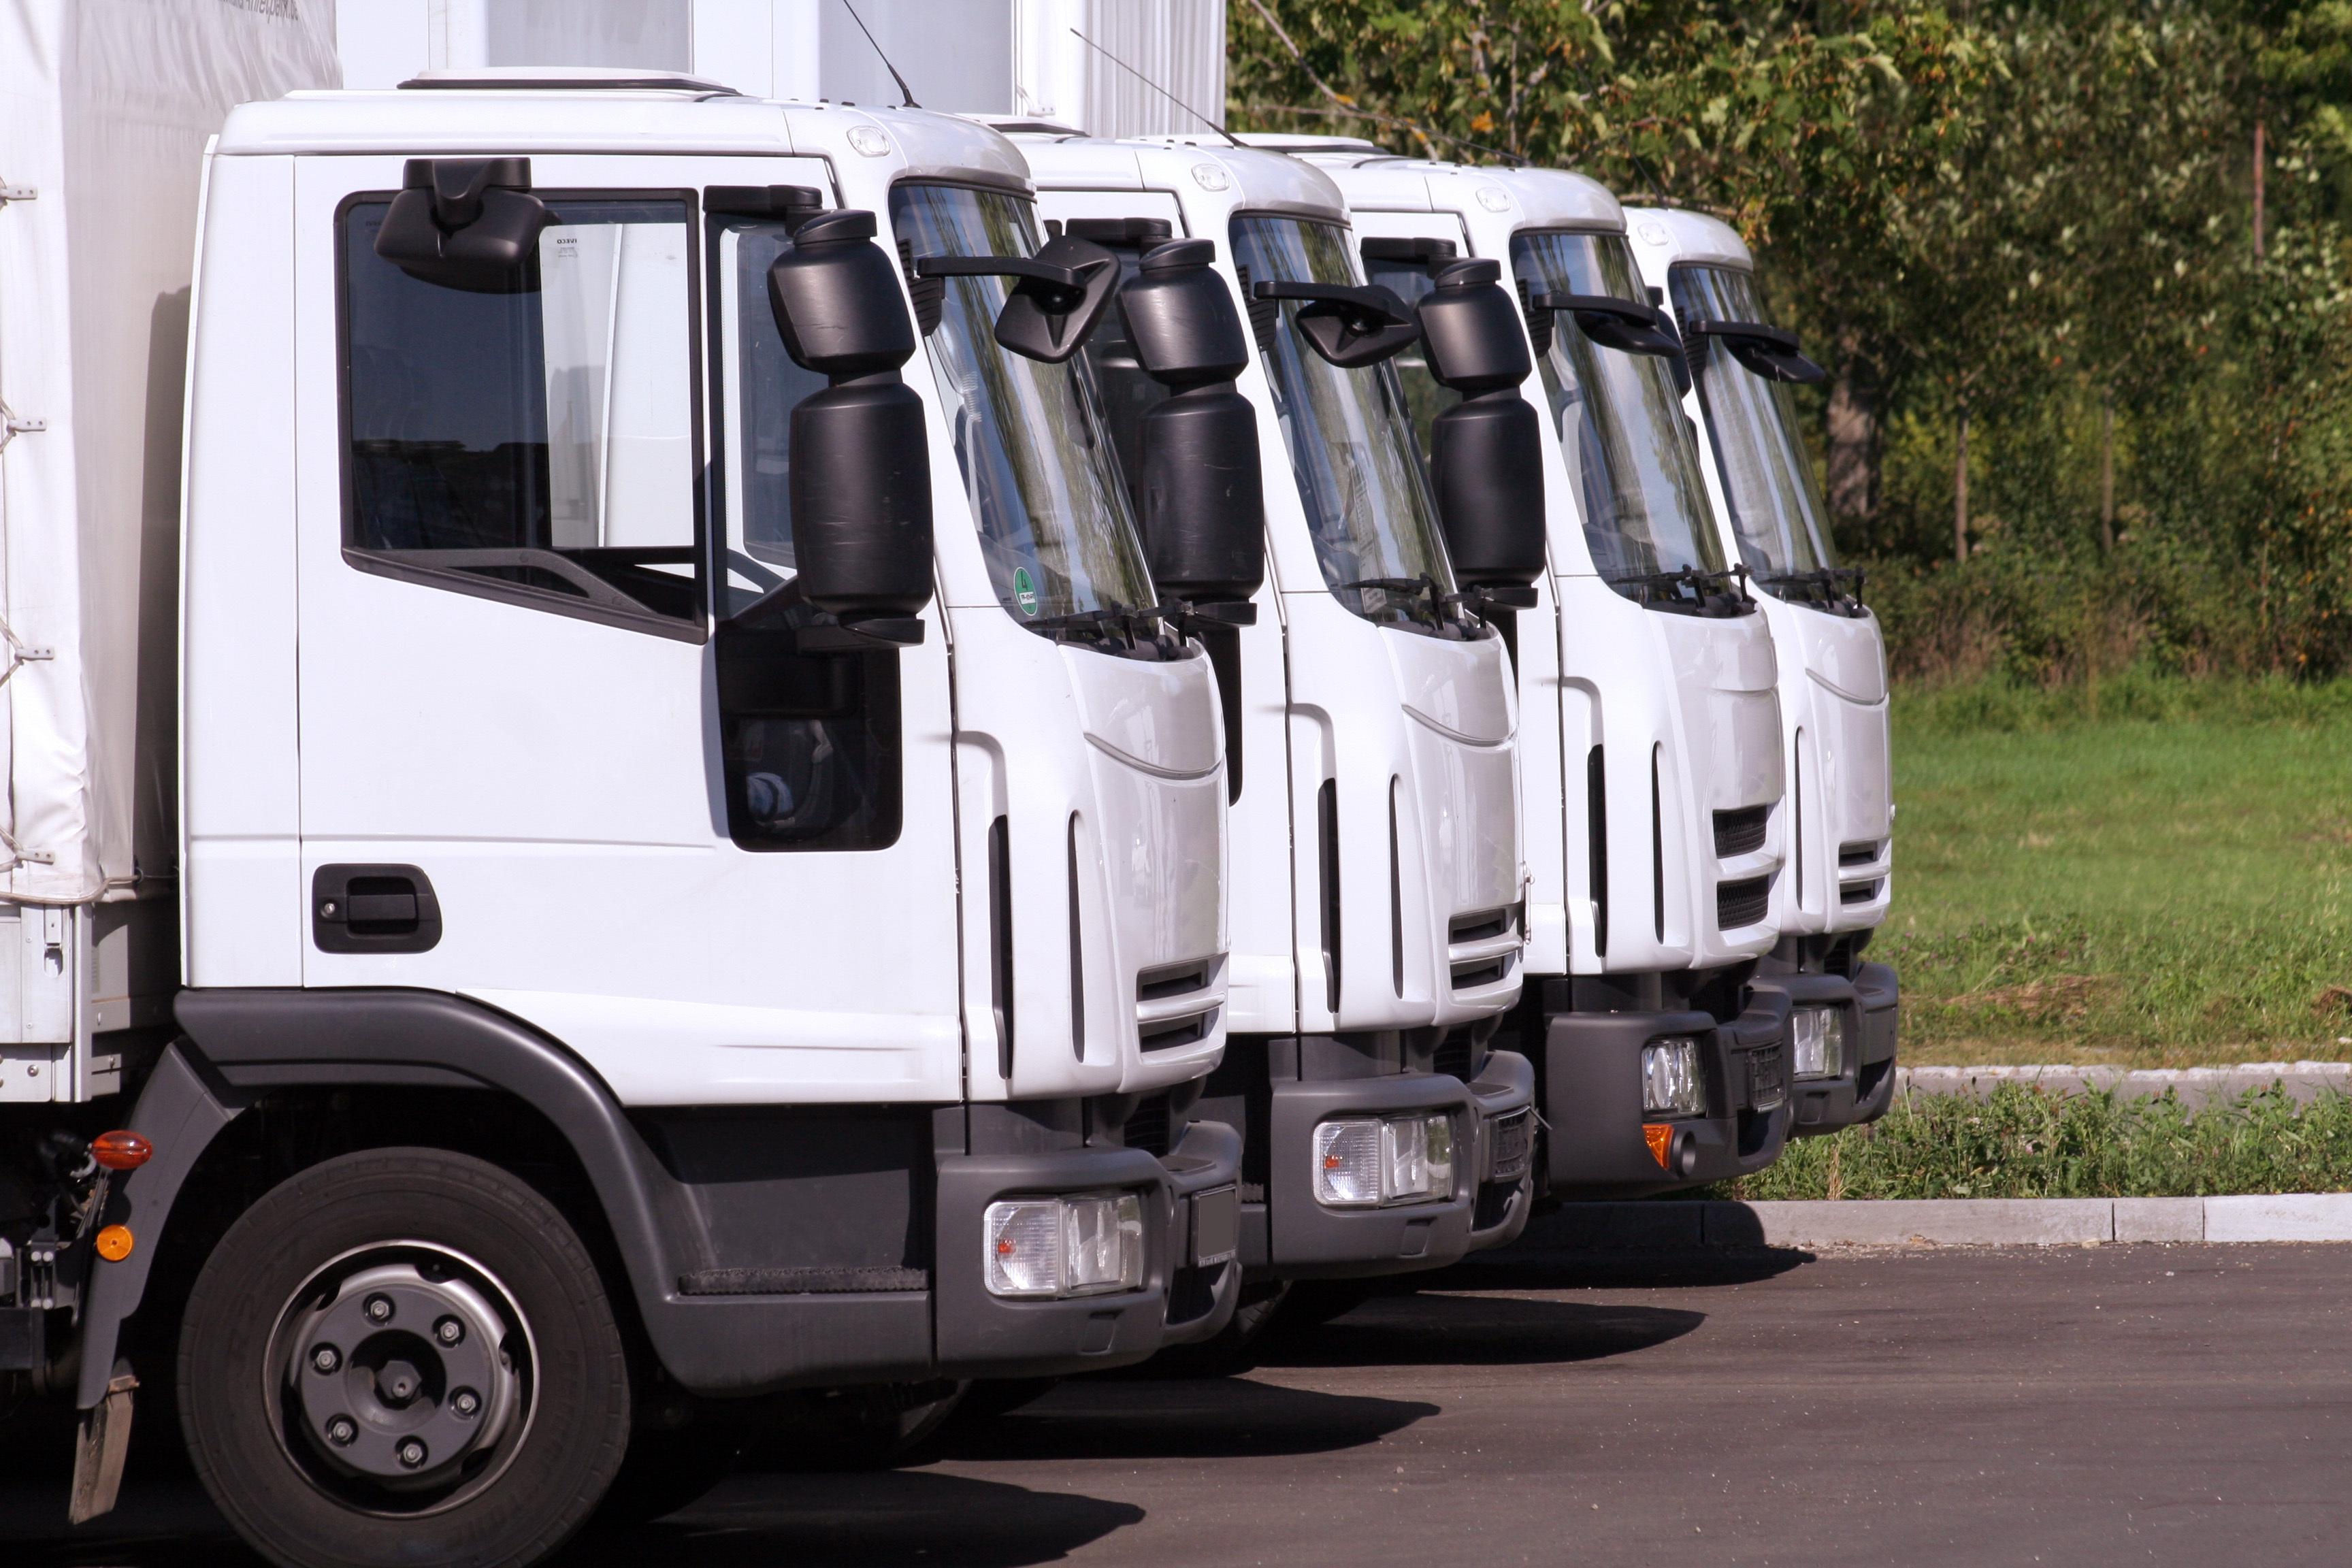 A line of HGV trucks that use telematics